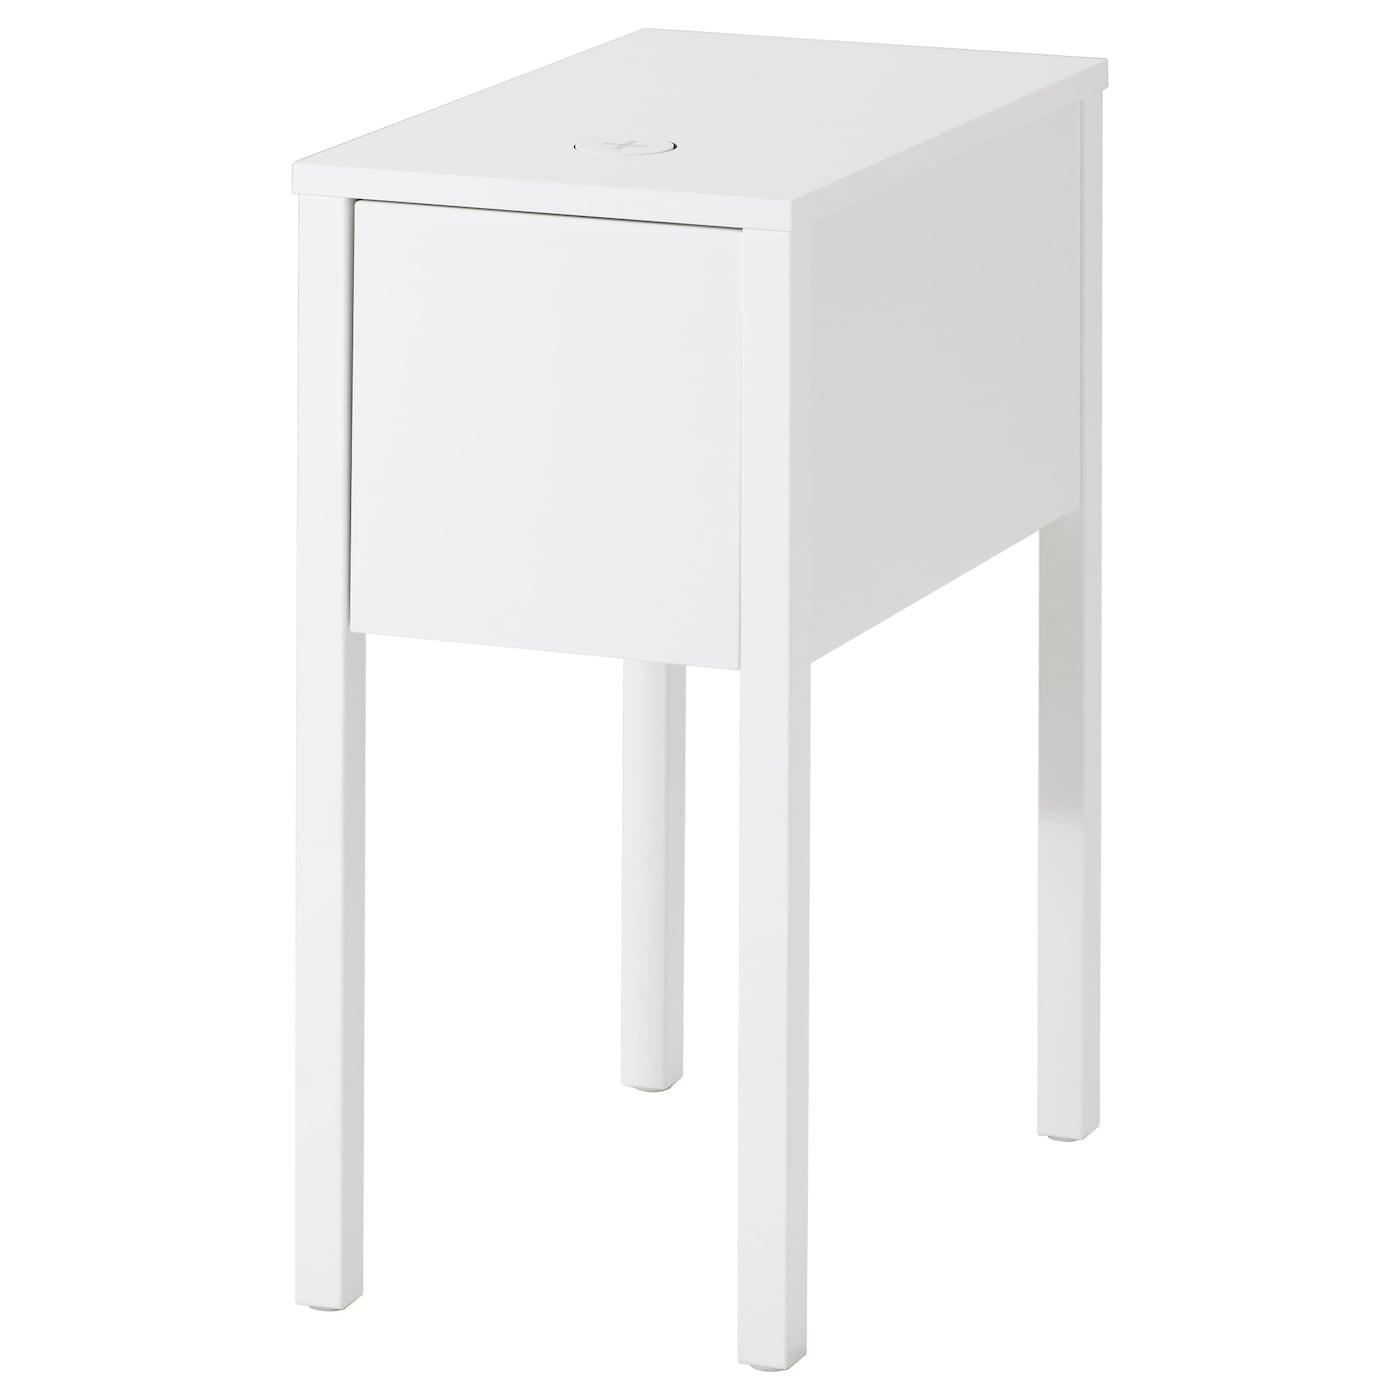 bedside lockers tables ikea ireland. Black Bedroom Furniture Sets. Home Design Ideas